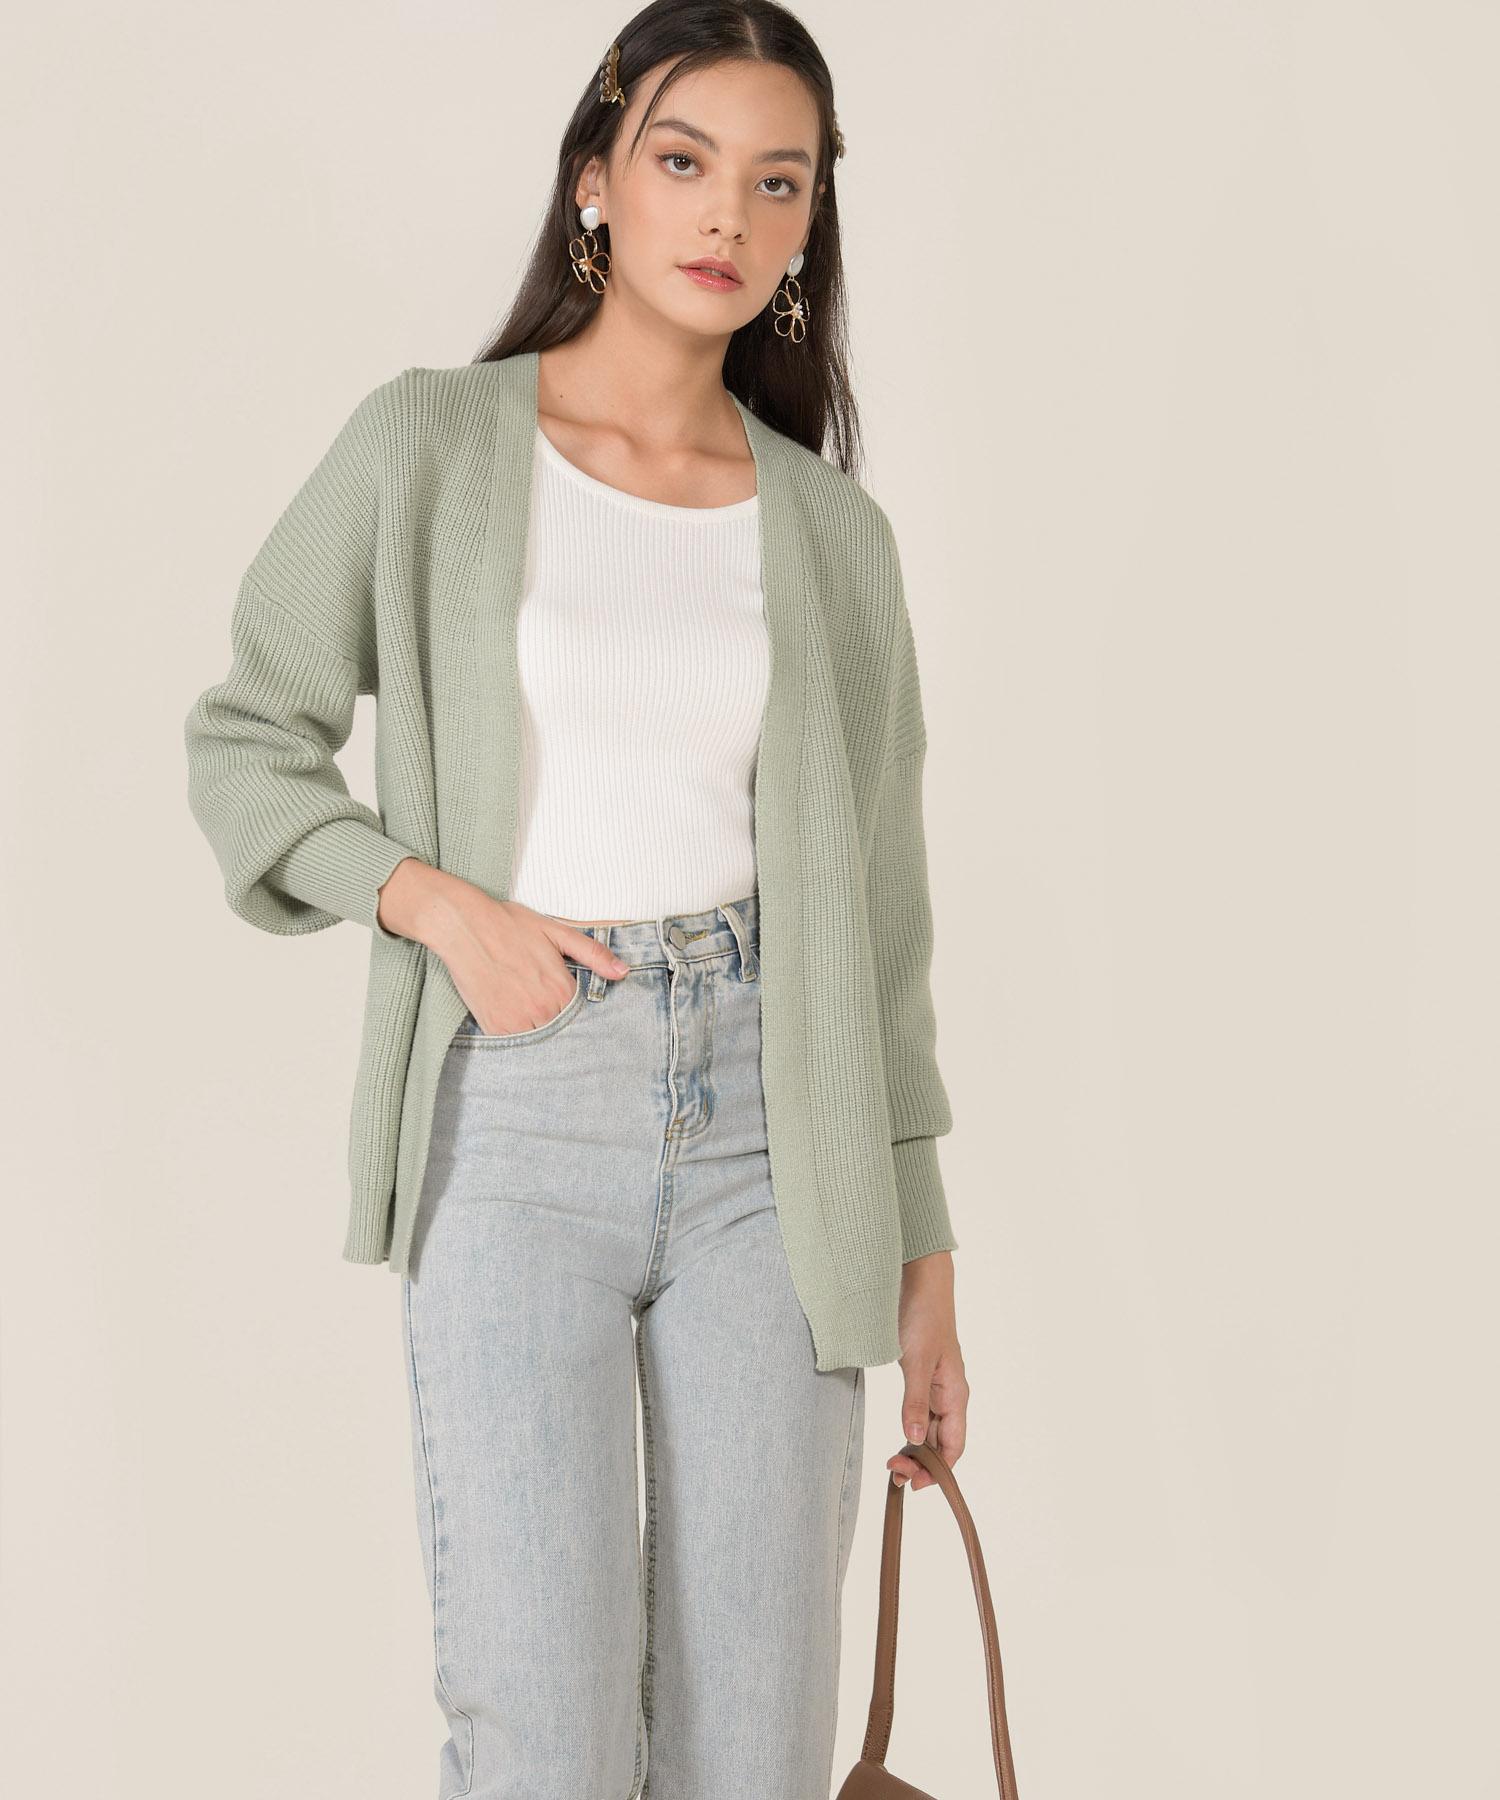 everett-knit-oversized-cardigan-sage-1